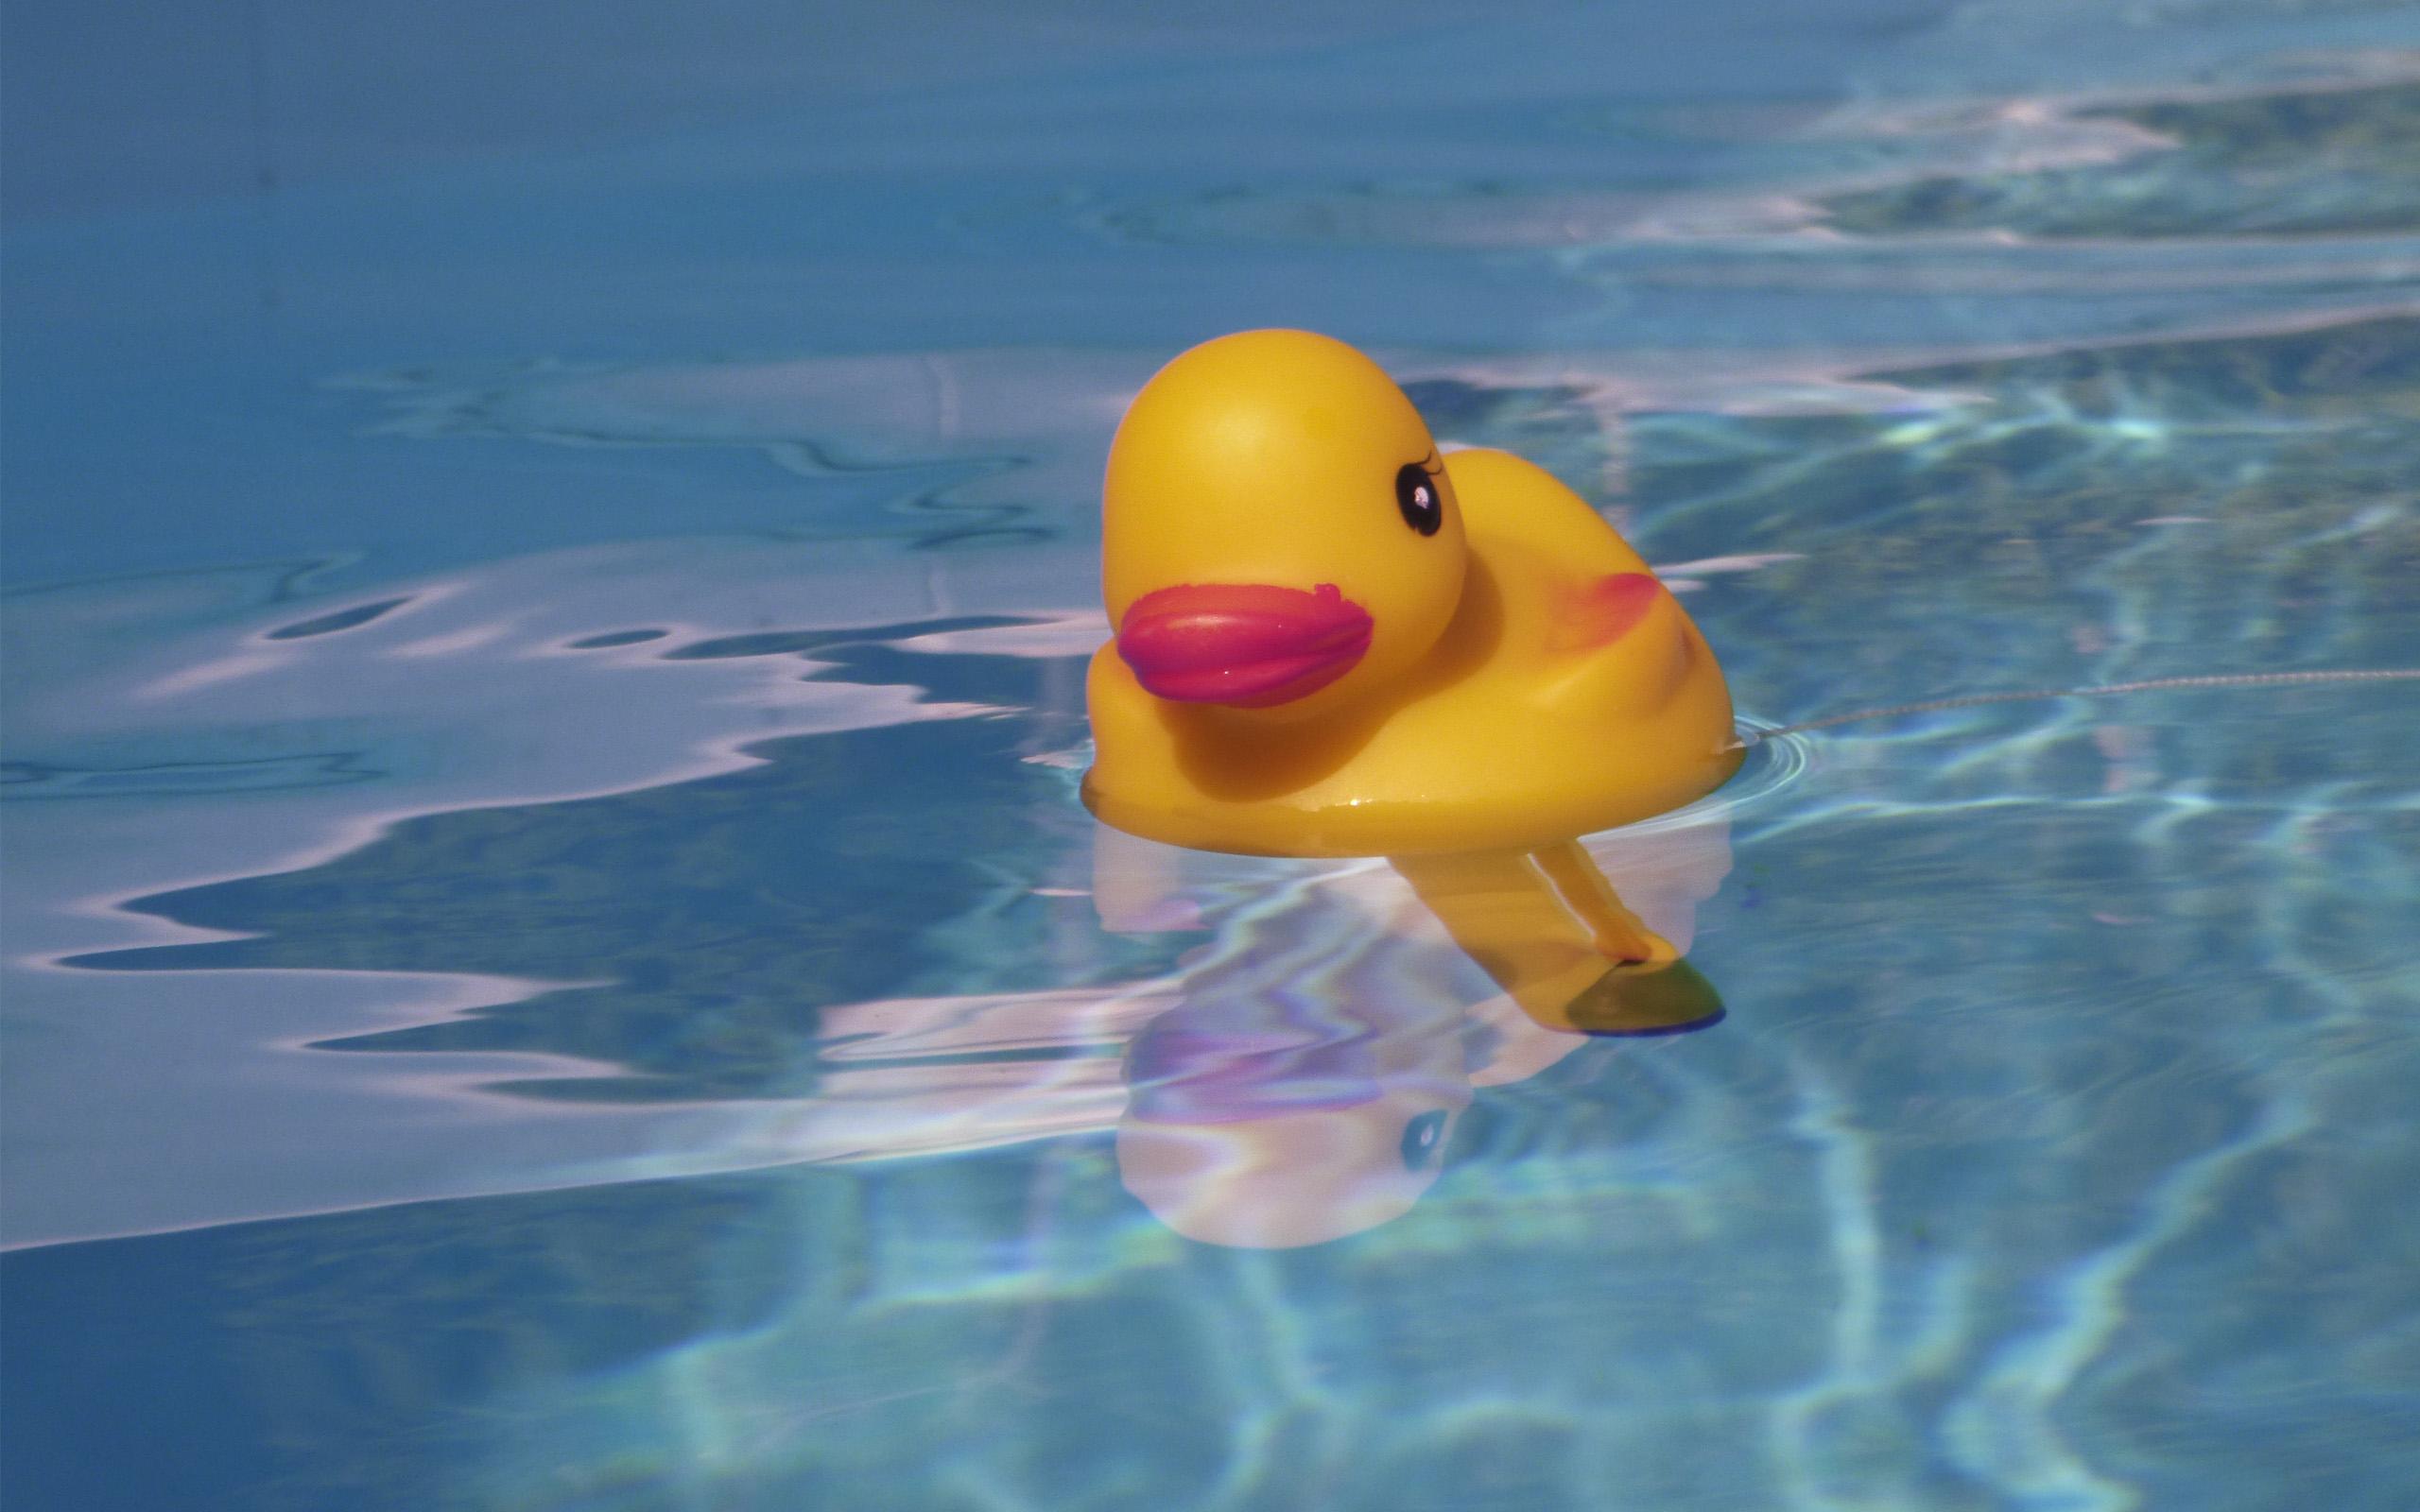 Wassererwärmung